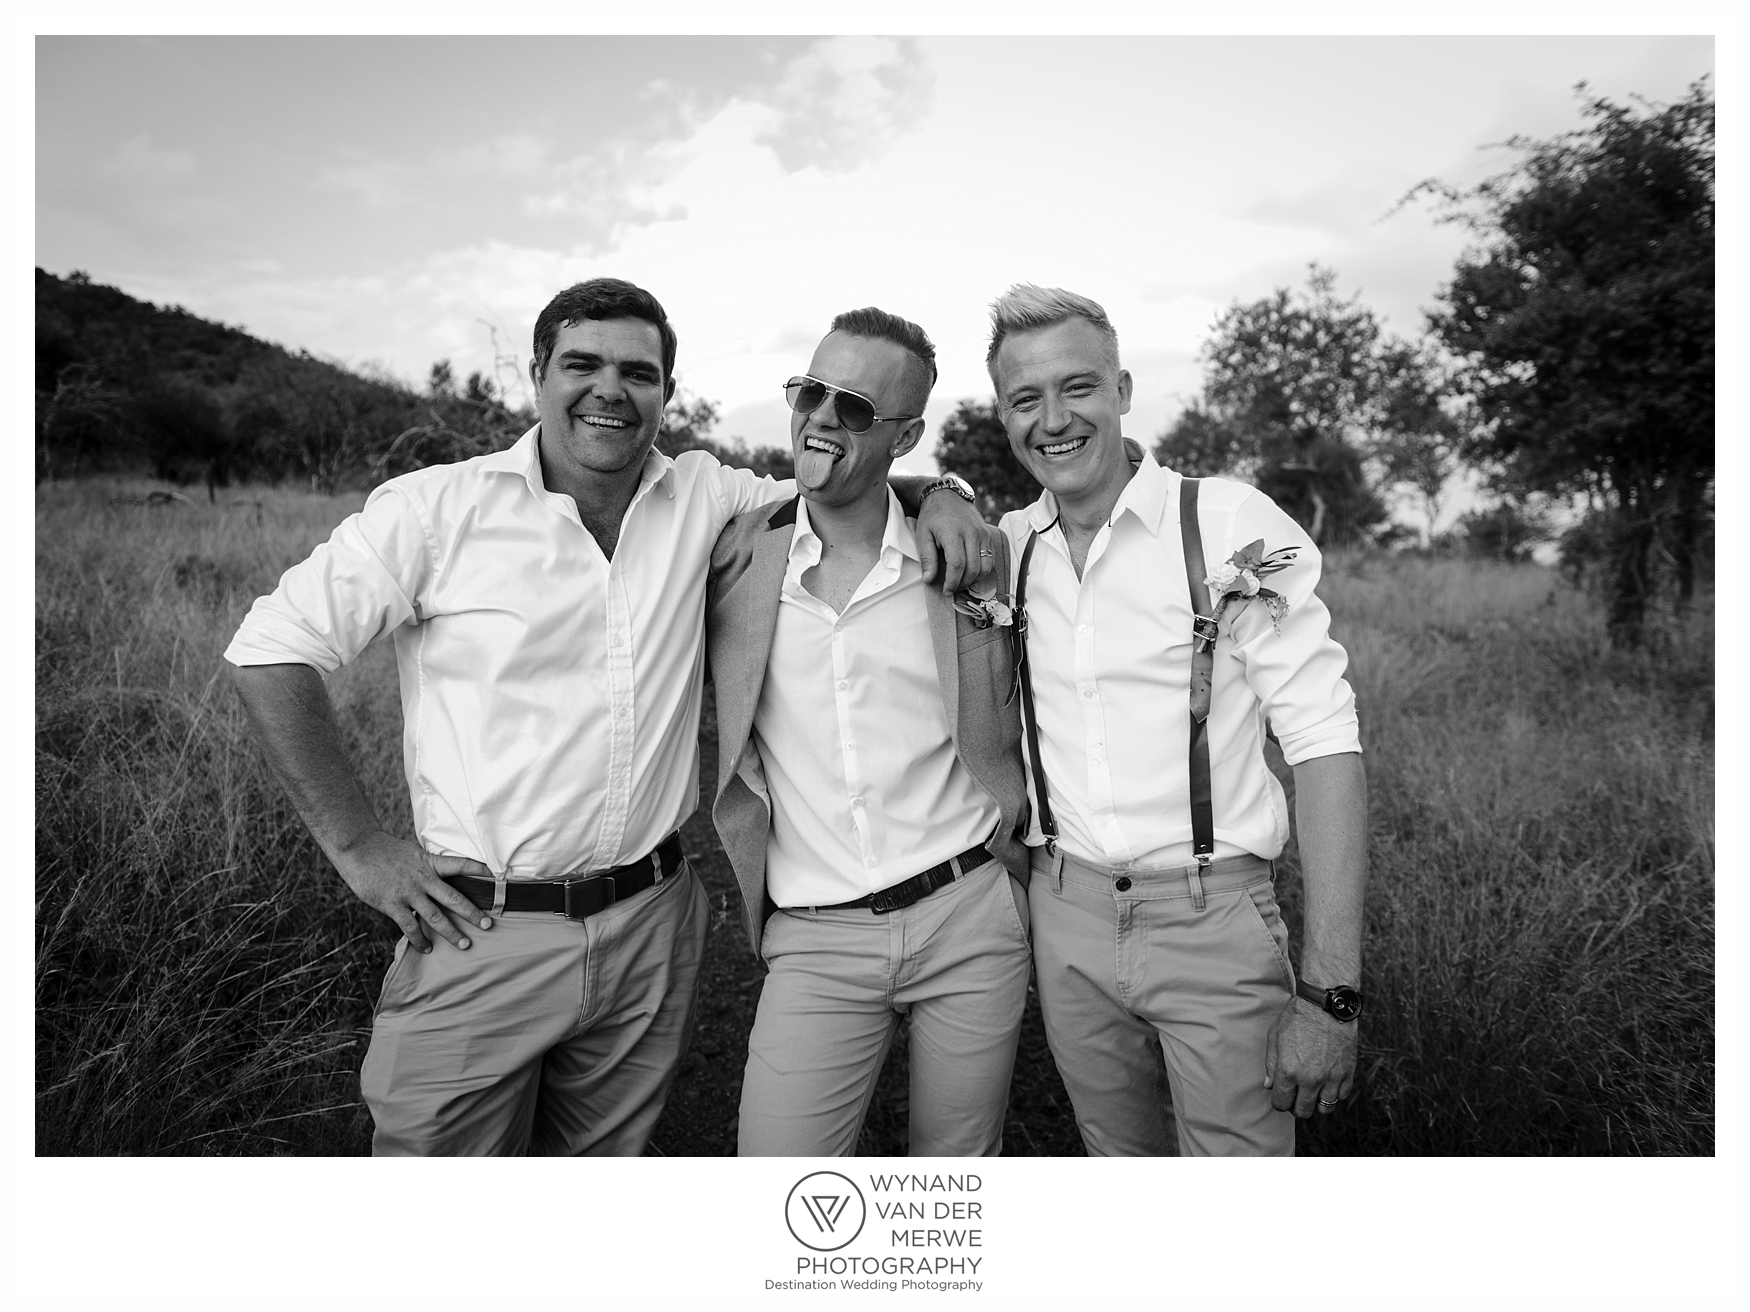 WynandvanderMerwe_weddingphotography_bushveldwedding_northam_bushveld_limpopowedding_limpopo_southafrica-166.jpg